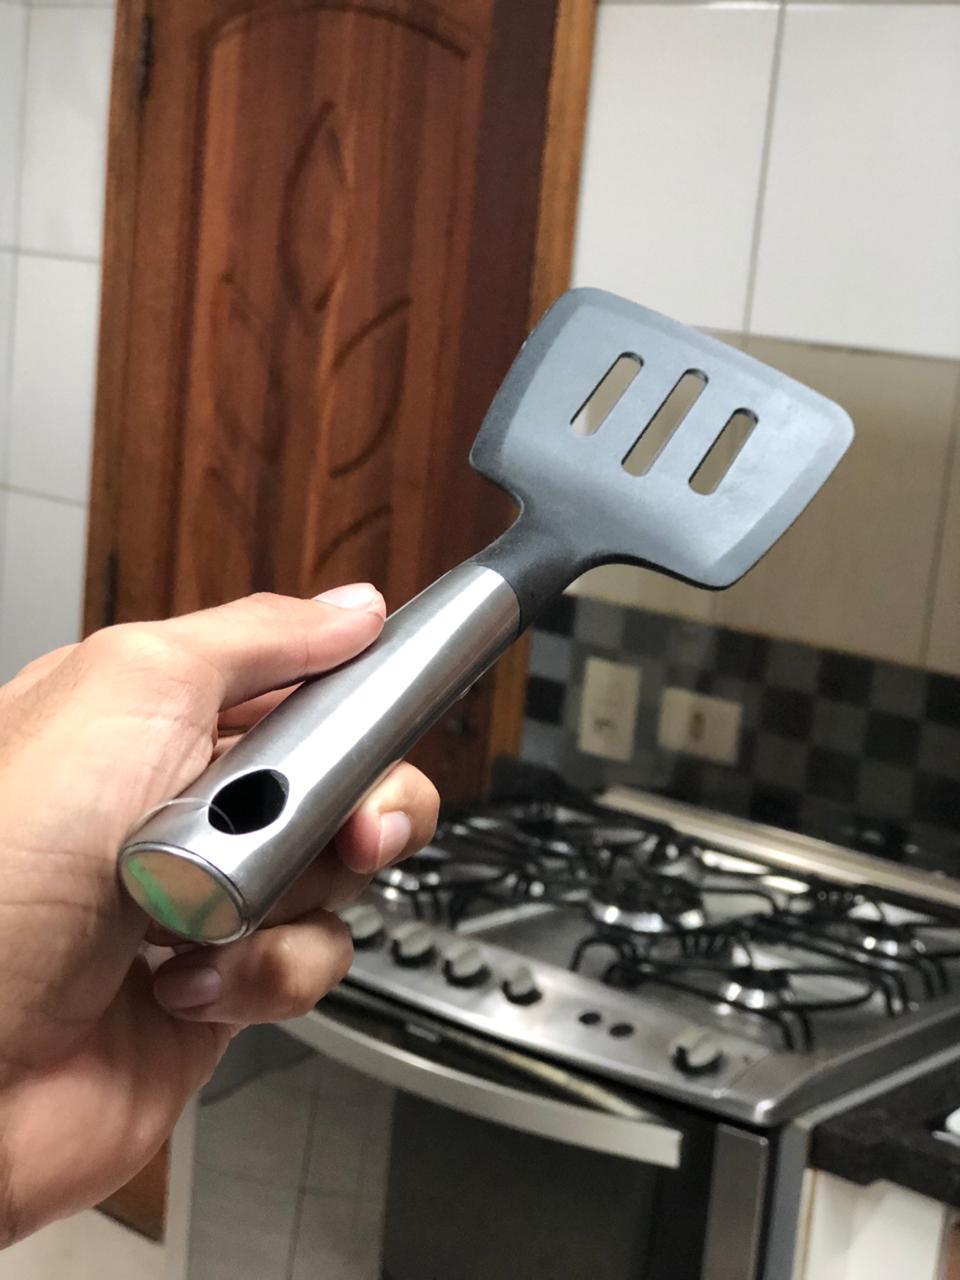 Espatula Fritura Vazada Utensílio Cozinha Nylon Inox Preta 35cm